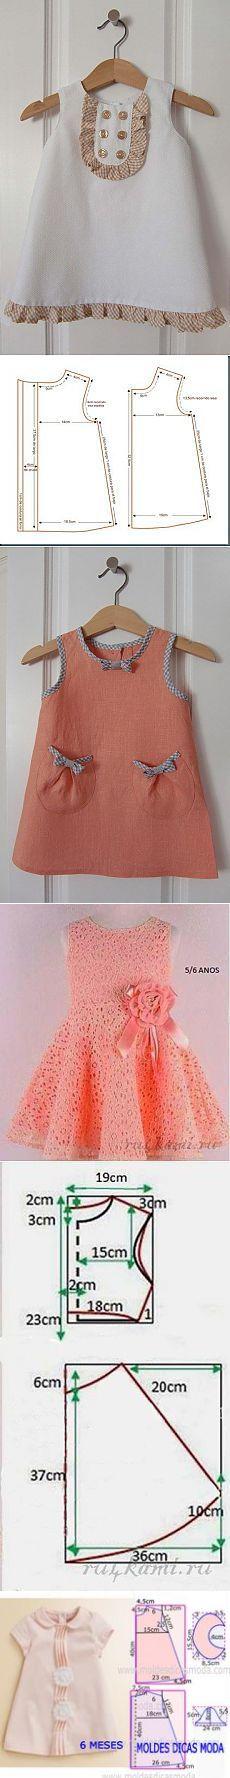 Children dress pattern ...♥ Deniz ♥